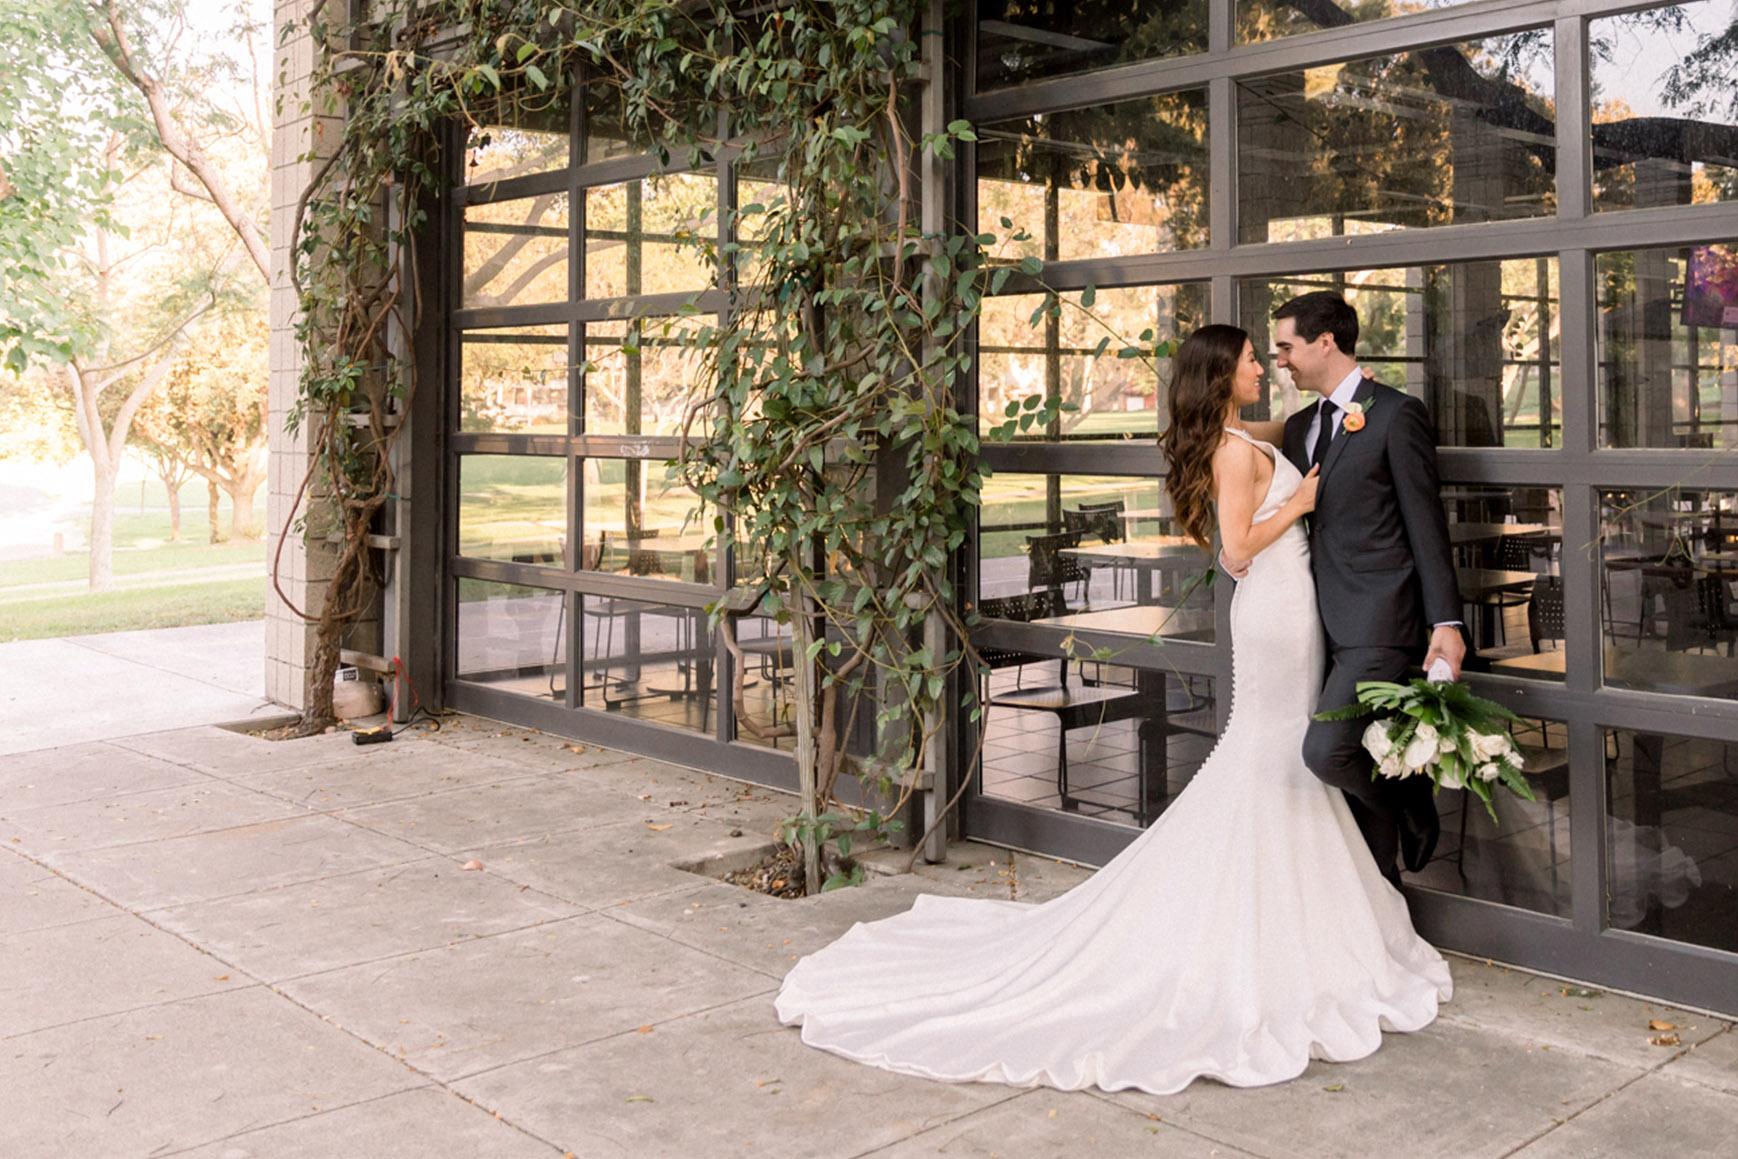 Couple by ivy - University Club - Irvine, California - Orange County - Wedgewood Weddings